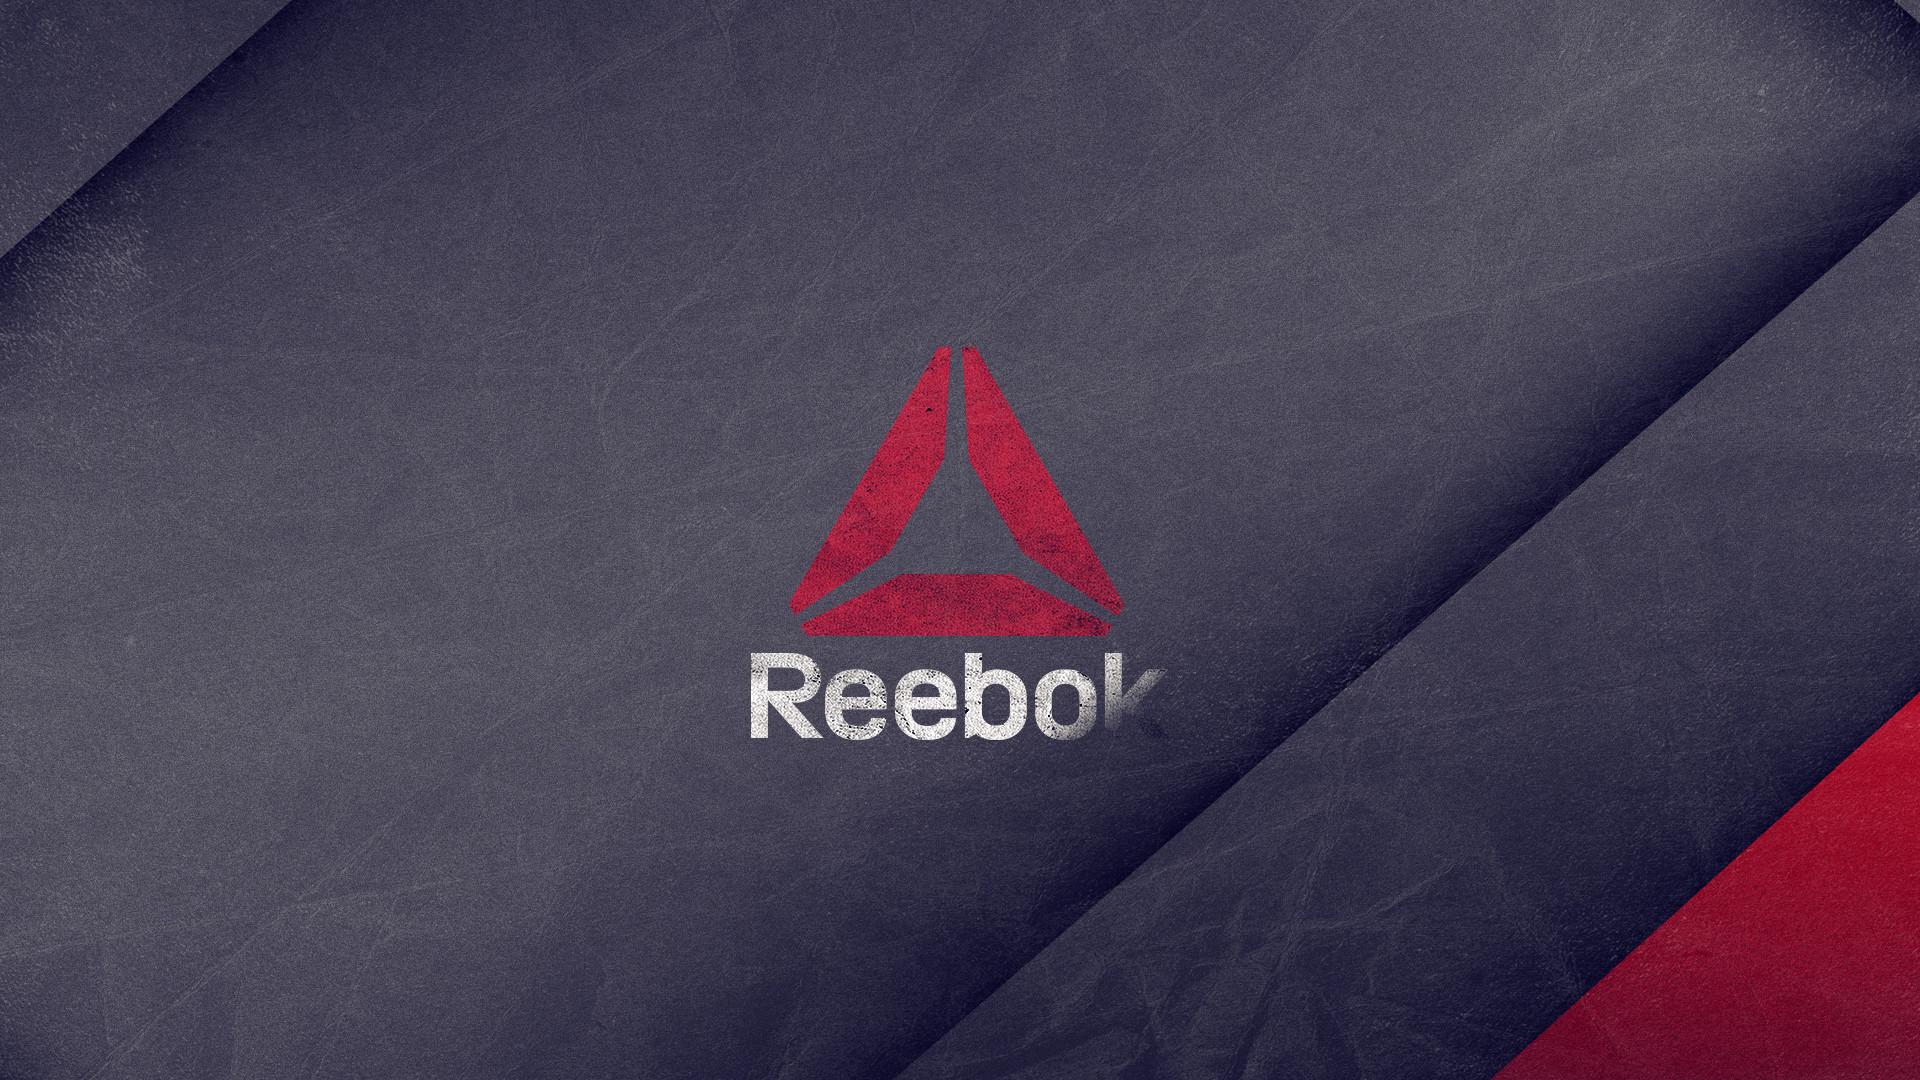 Deadpool Logo Wallpaper Hd Ufc Logo Wallpaper 60 Images